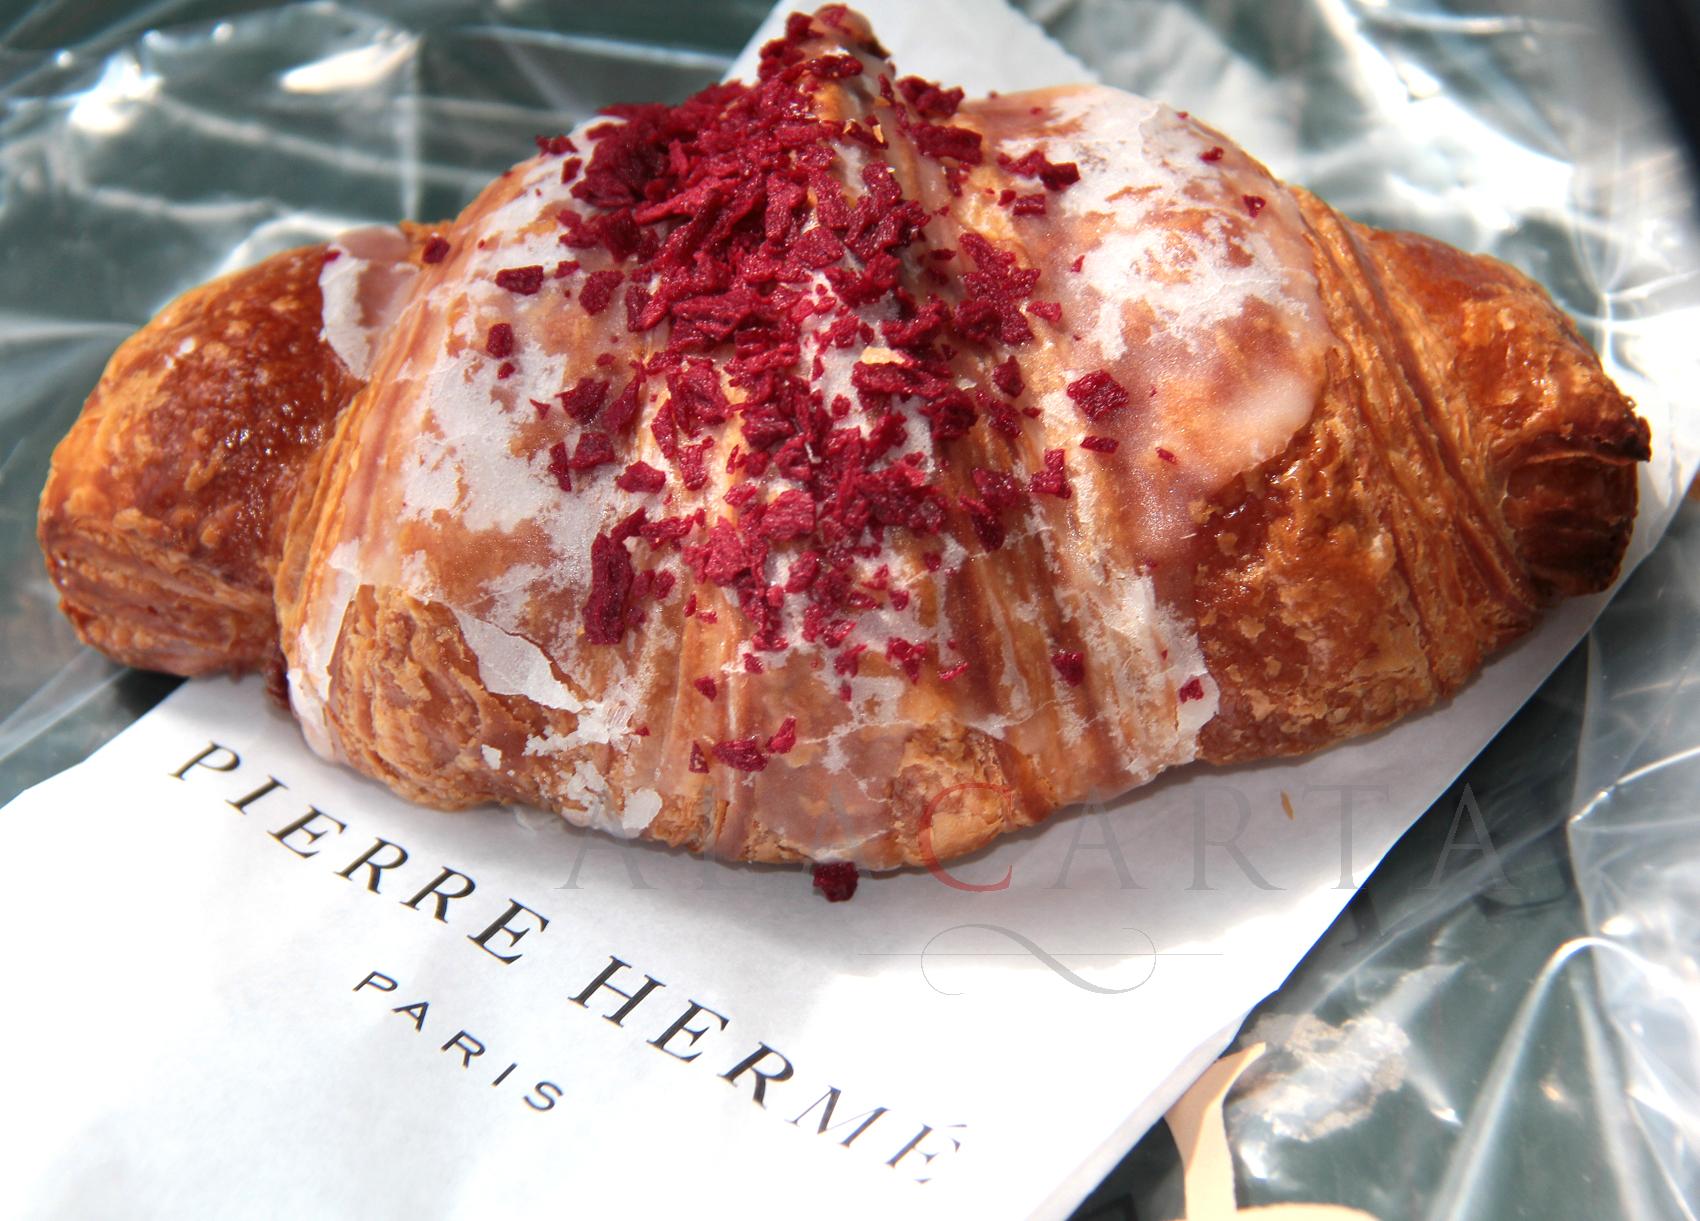 Croissant Pierre Herme Ispahan